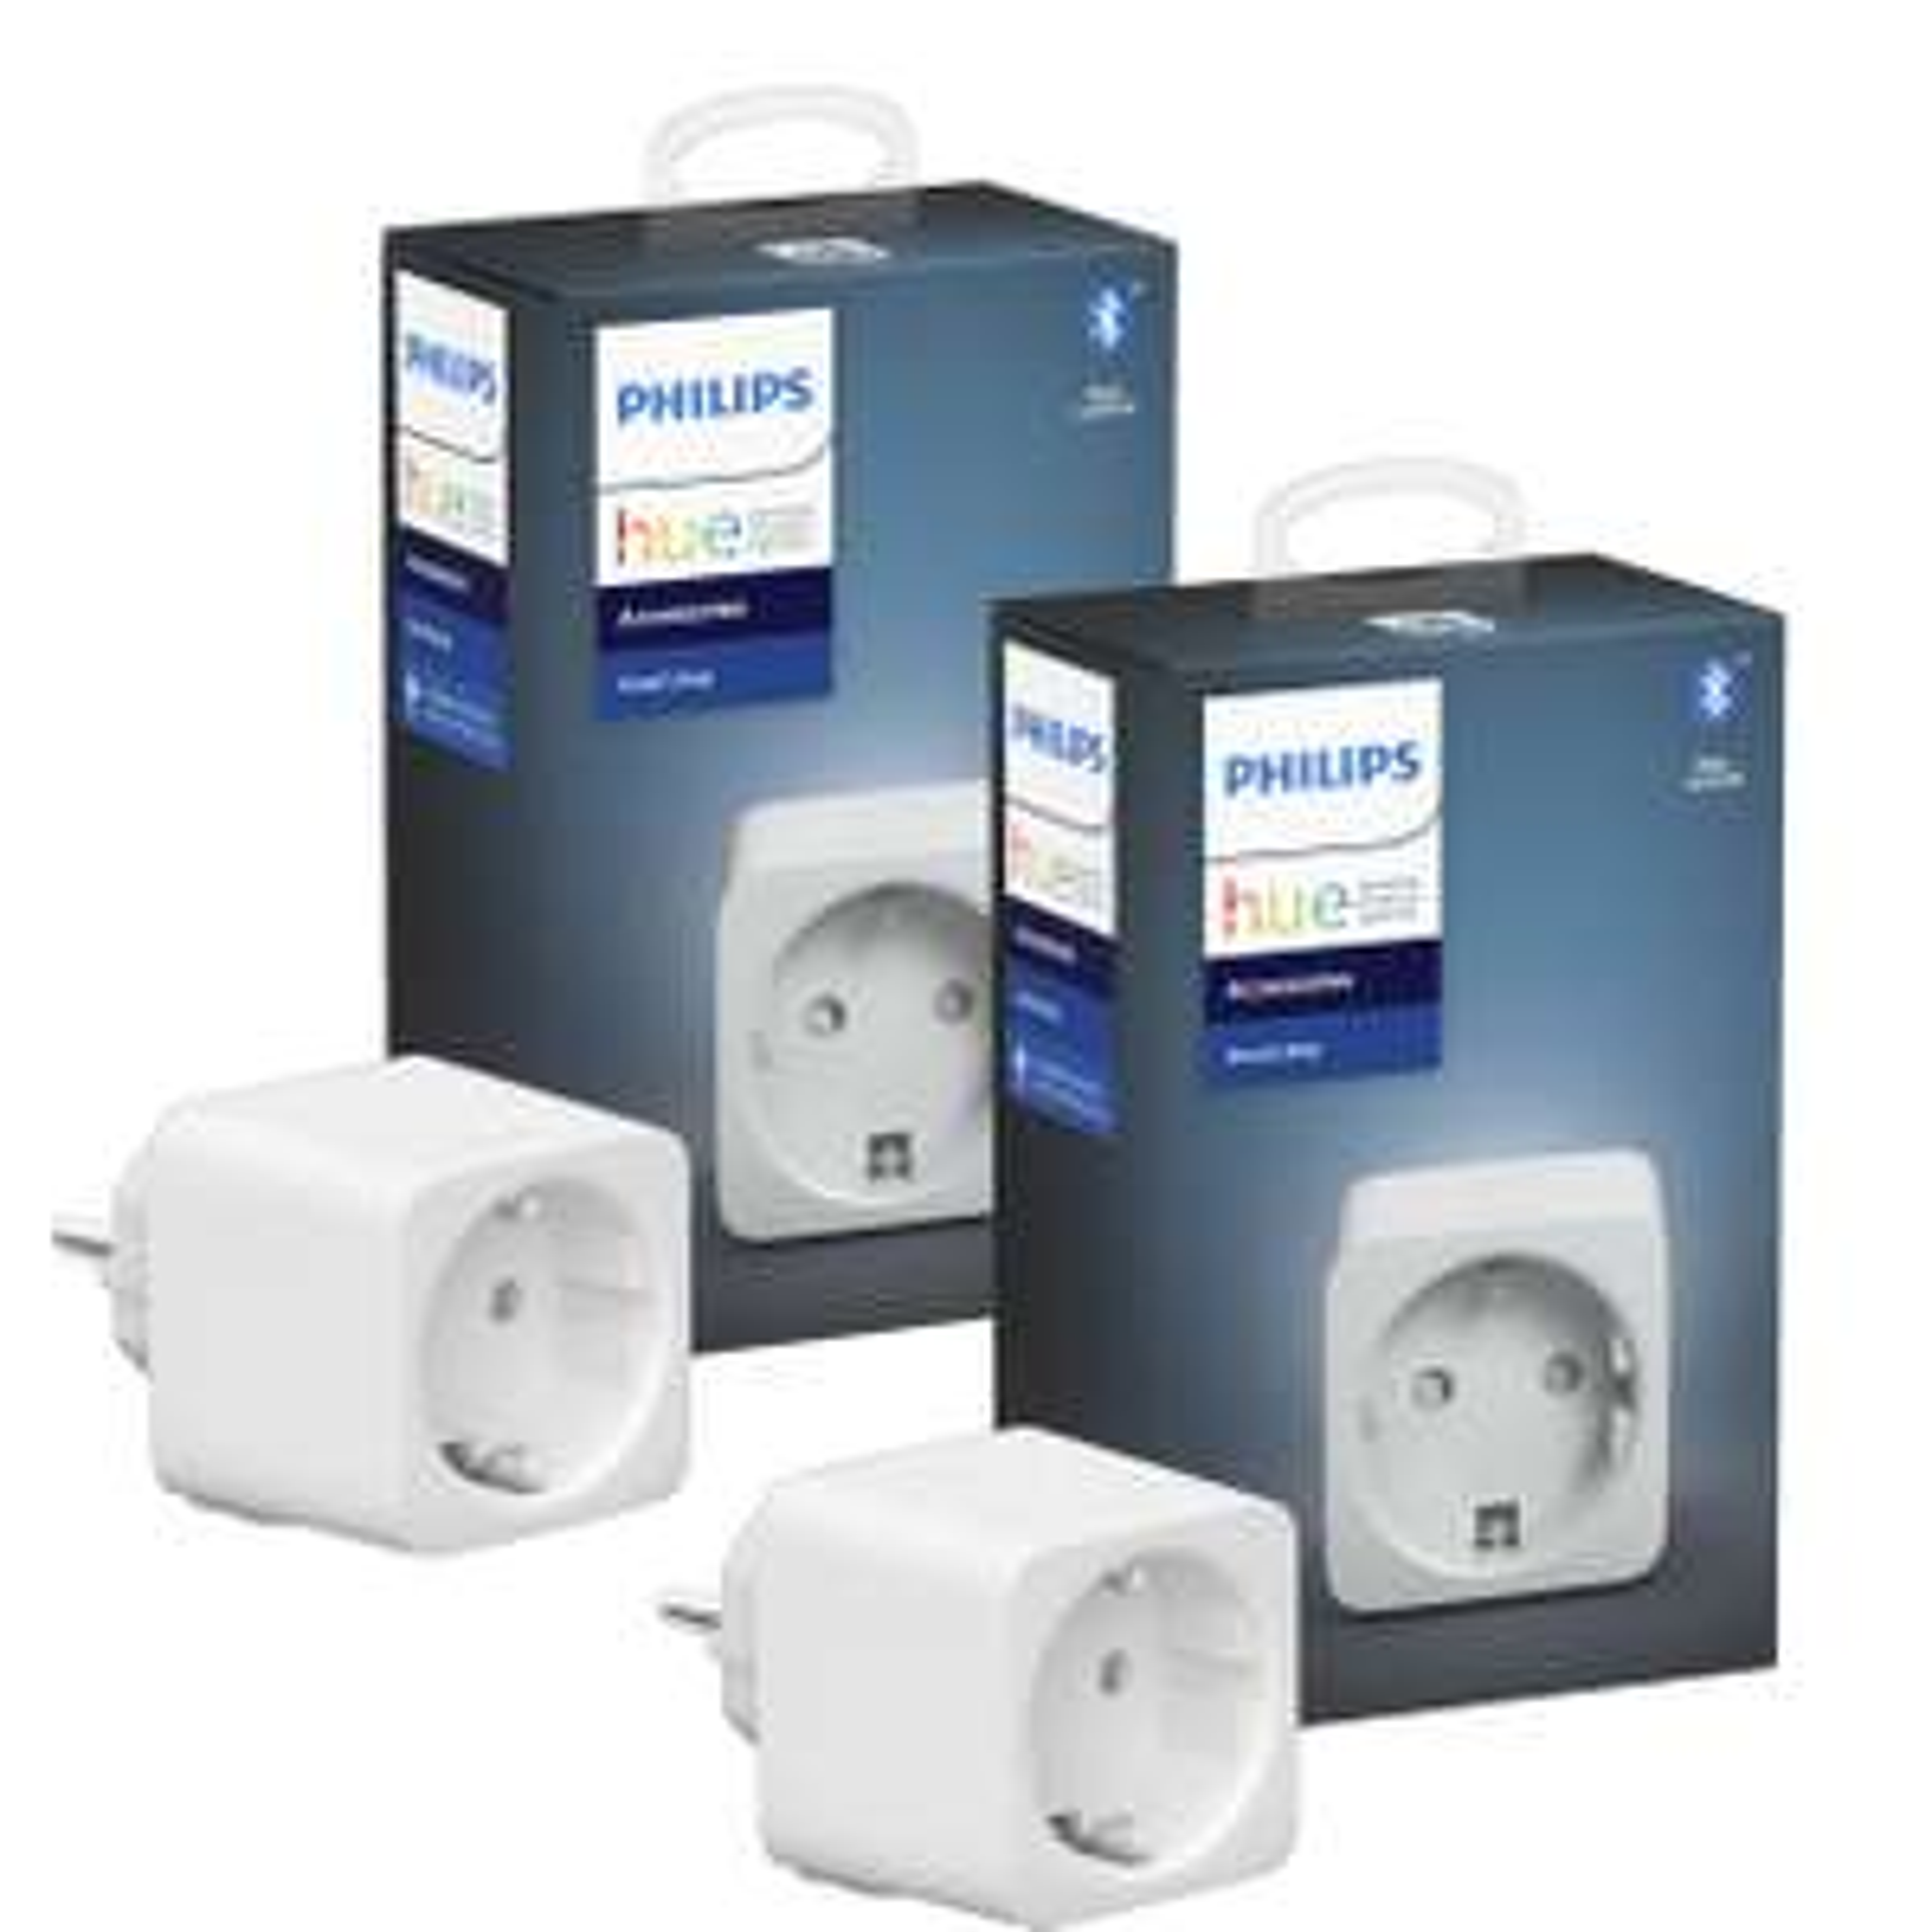 Philips Hue - 2 x Smart Plug